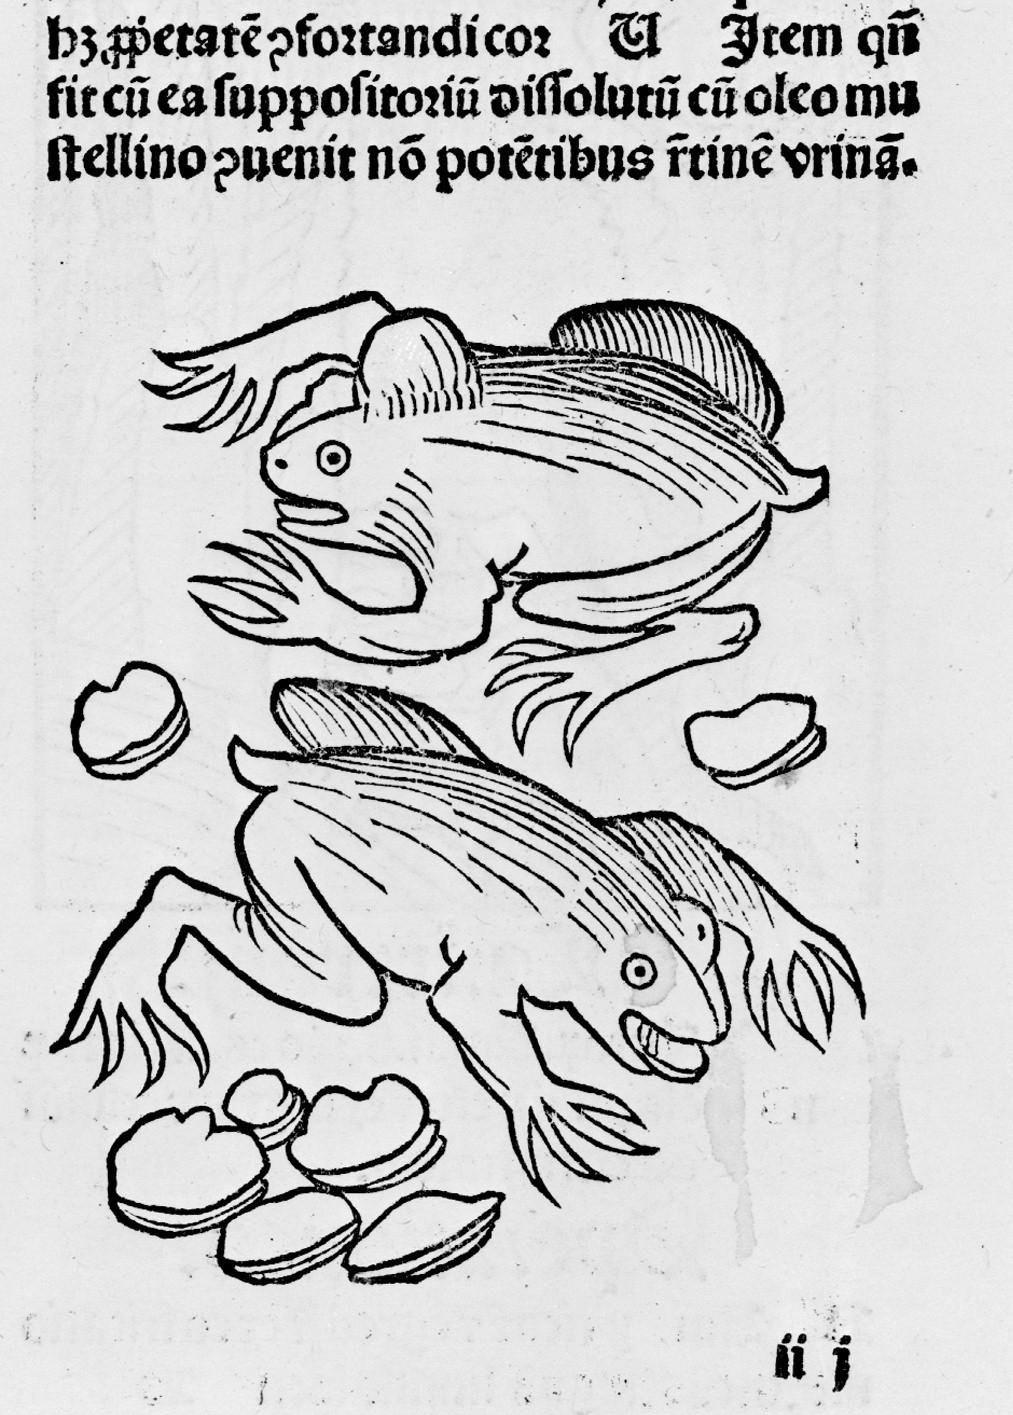 [Illustrations_de_Hortus_Sanitatis]___[...]Cuba_Johannes_btv1b2100001h_9